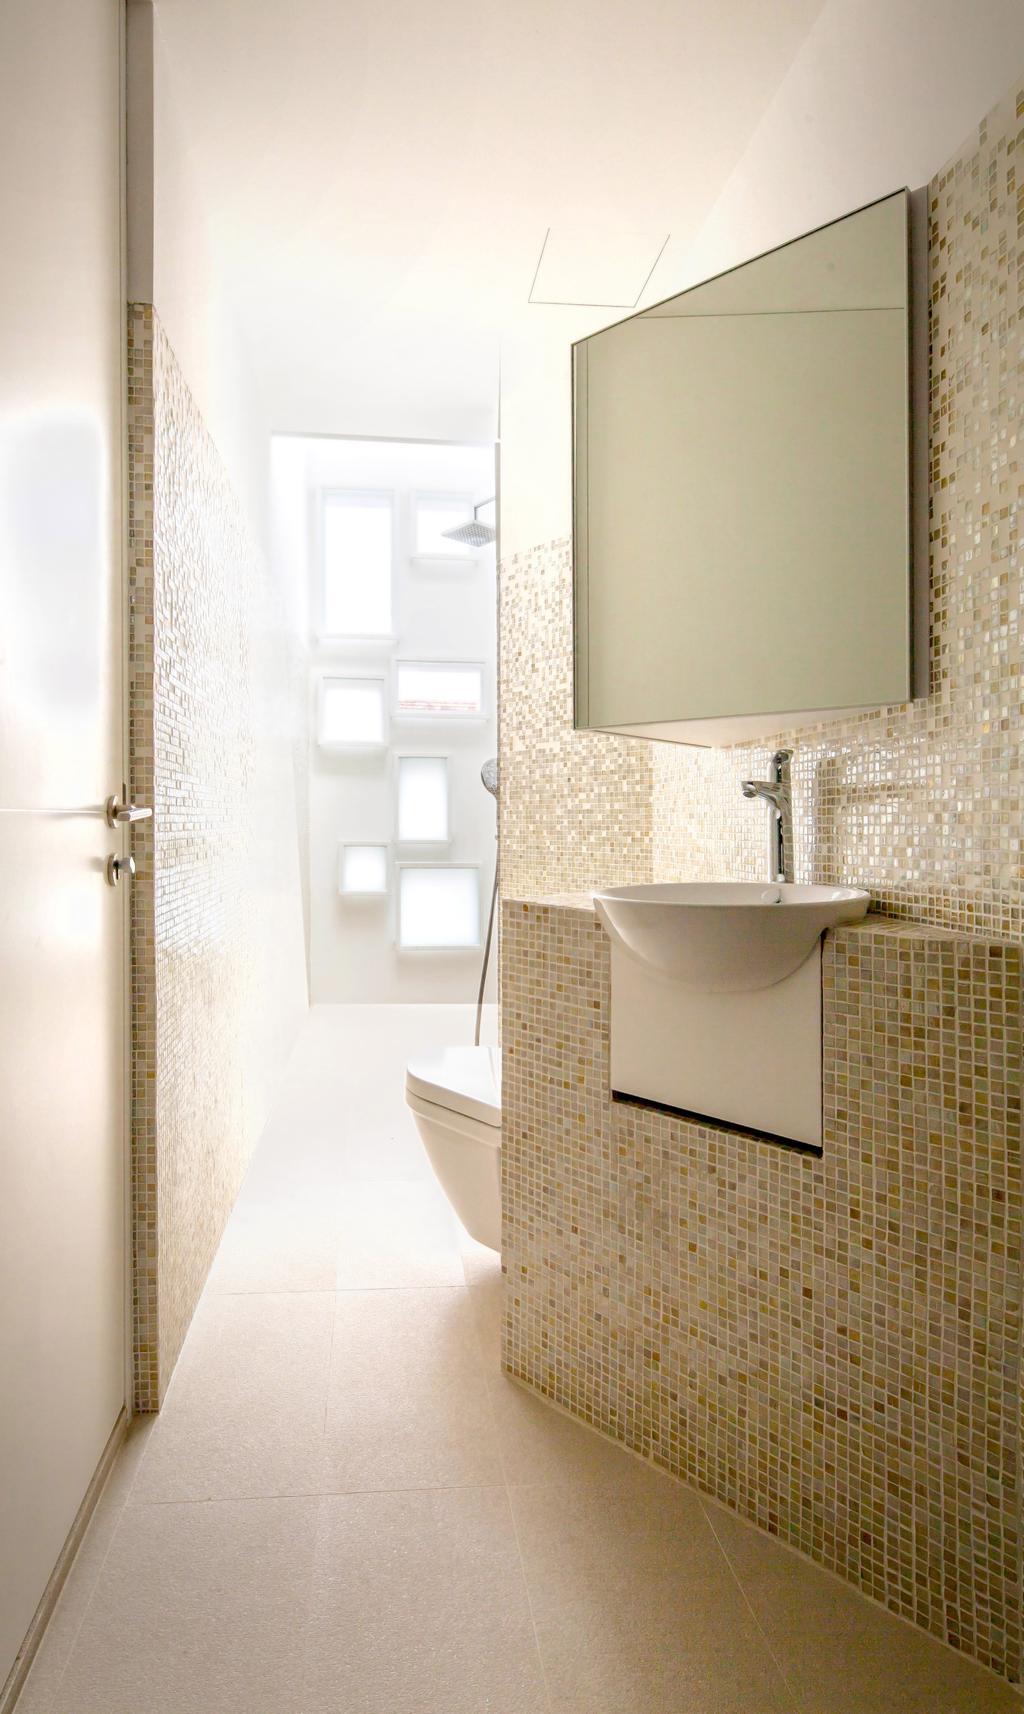 Contemporary, Landed, Bathroom, Belimbing Avenue, Architect, HYLA Architects, Wall, Indoors, Interior Design